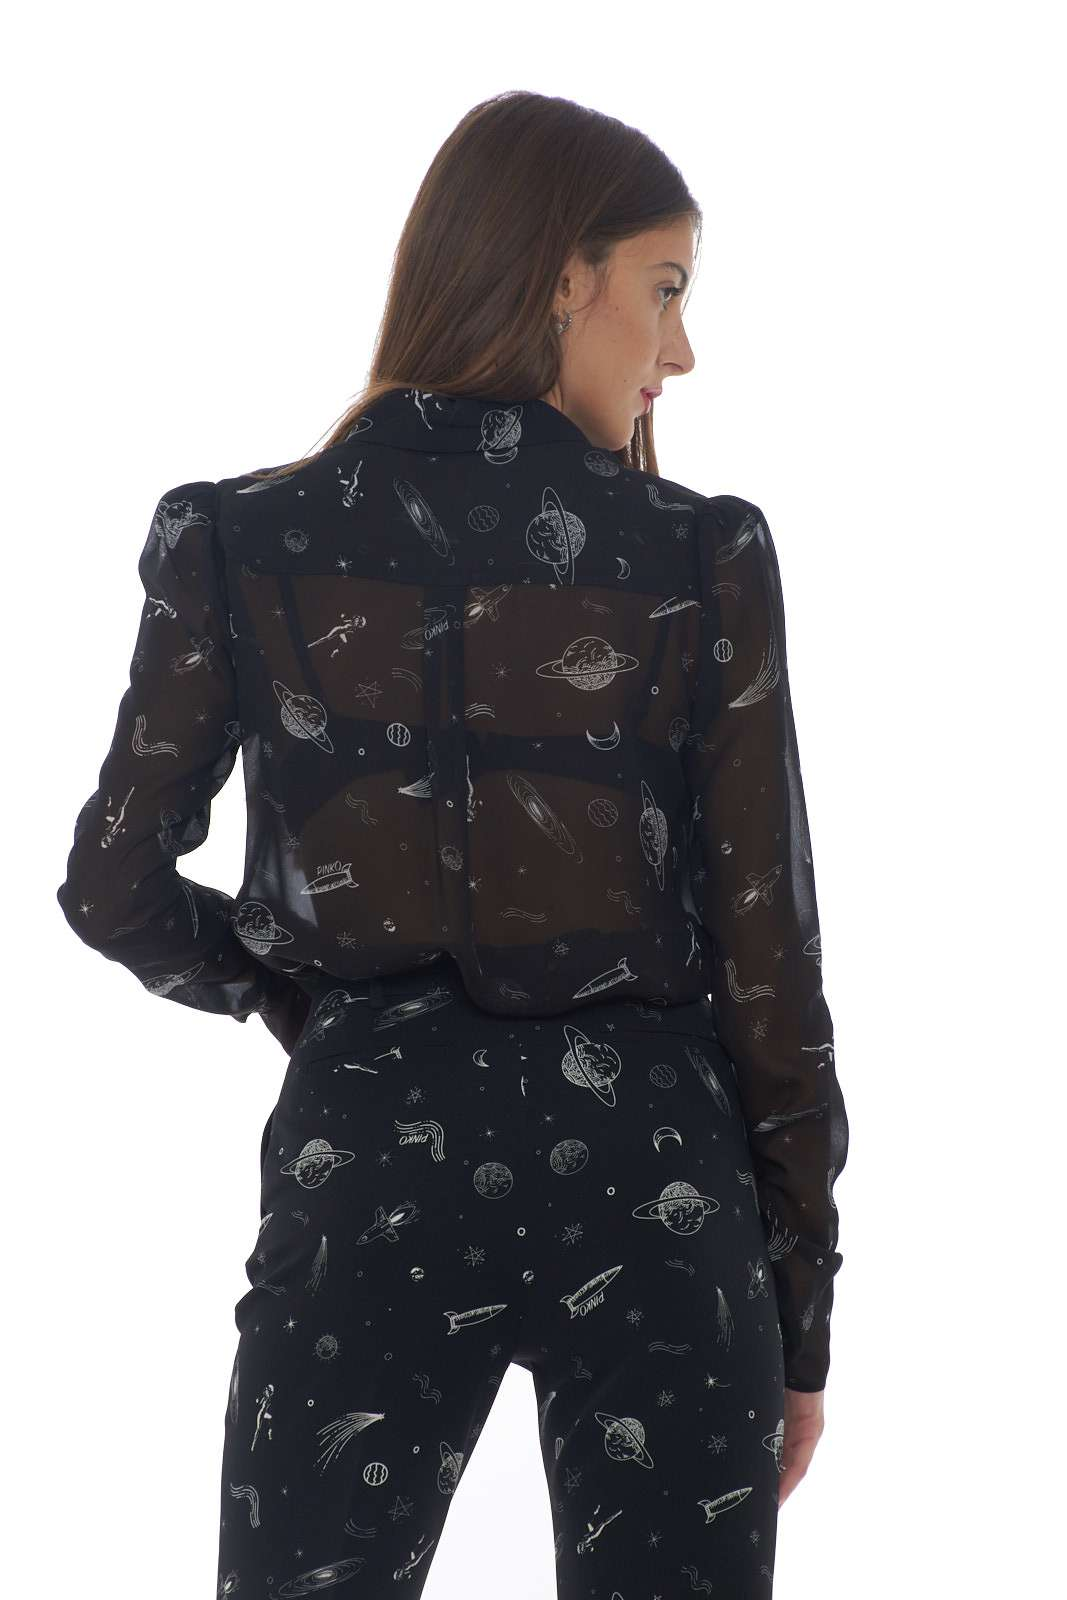 https://www.parmax.com/media/catalog/product/a/i/AI-outlet_parmax-camicia-donna-Pinko-1B145W-C.jpg